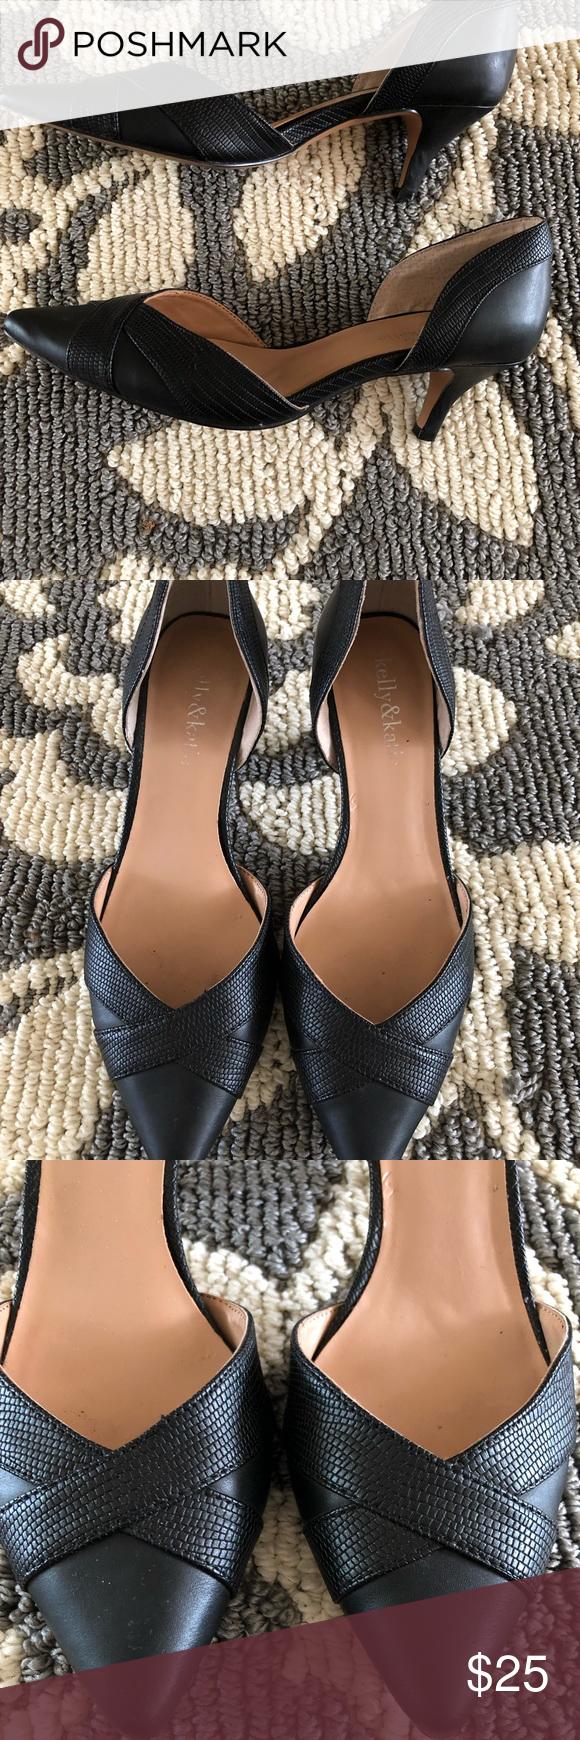 Kelly Katie Candice Shoes Women Heels Kelly Katie Kitten Heel Pumps